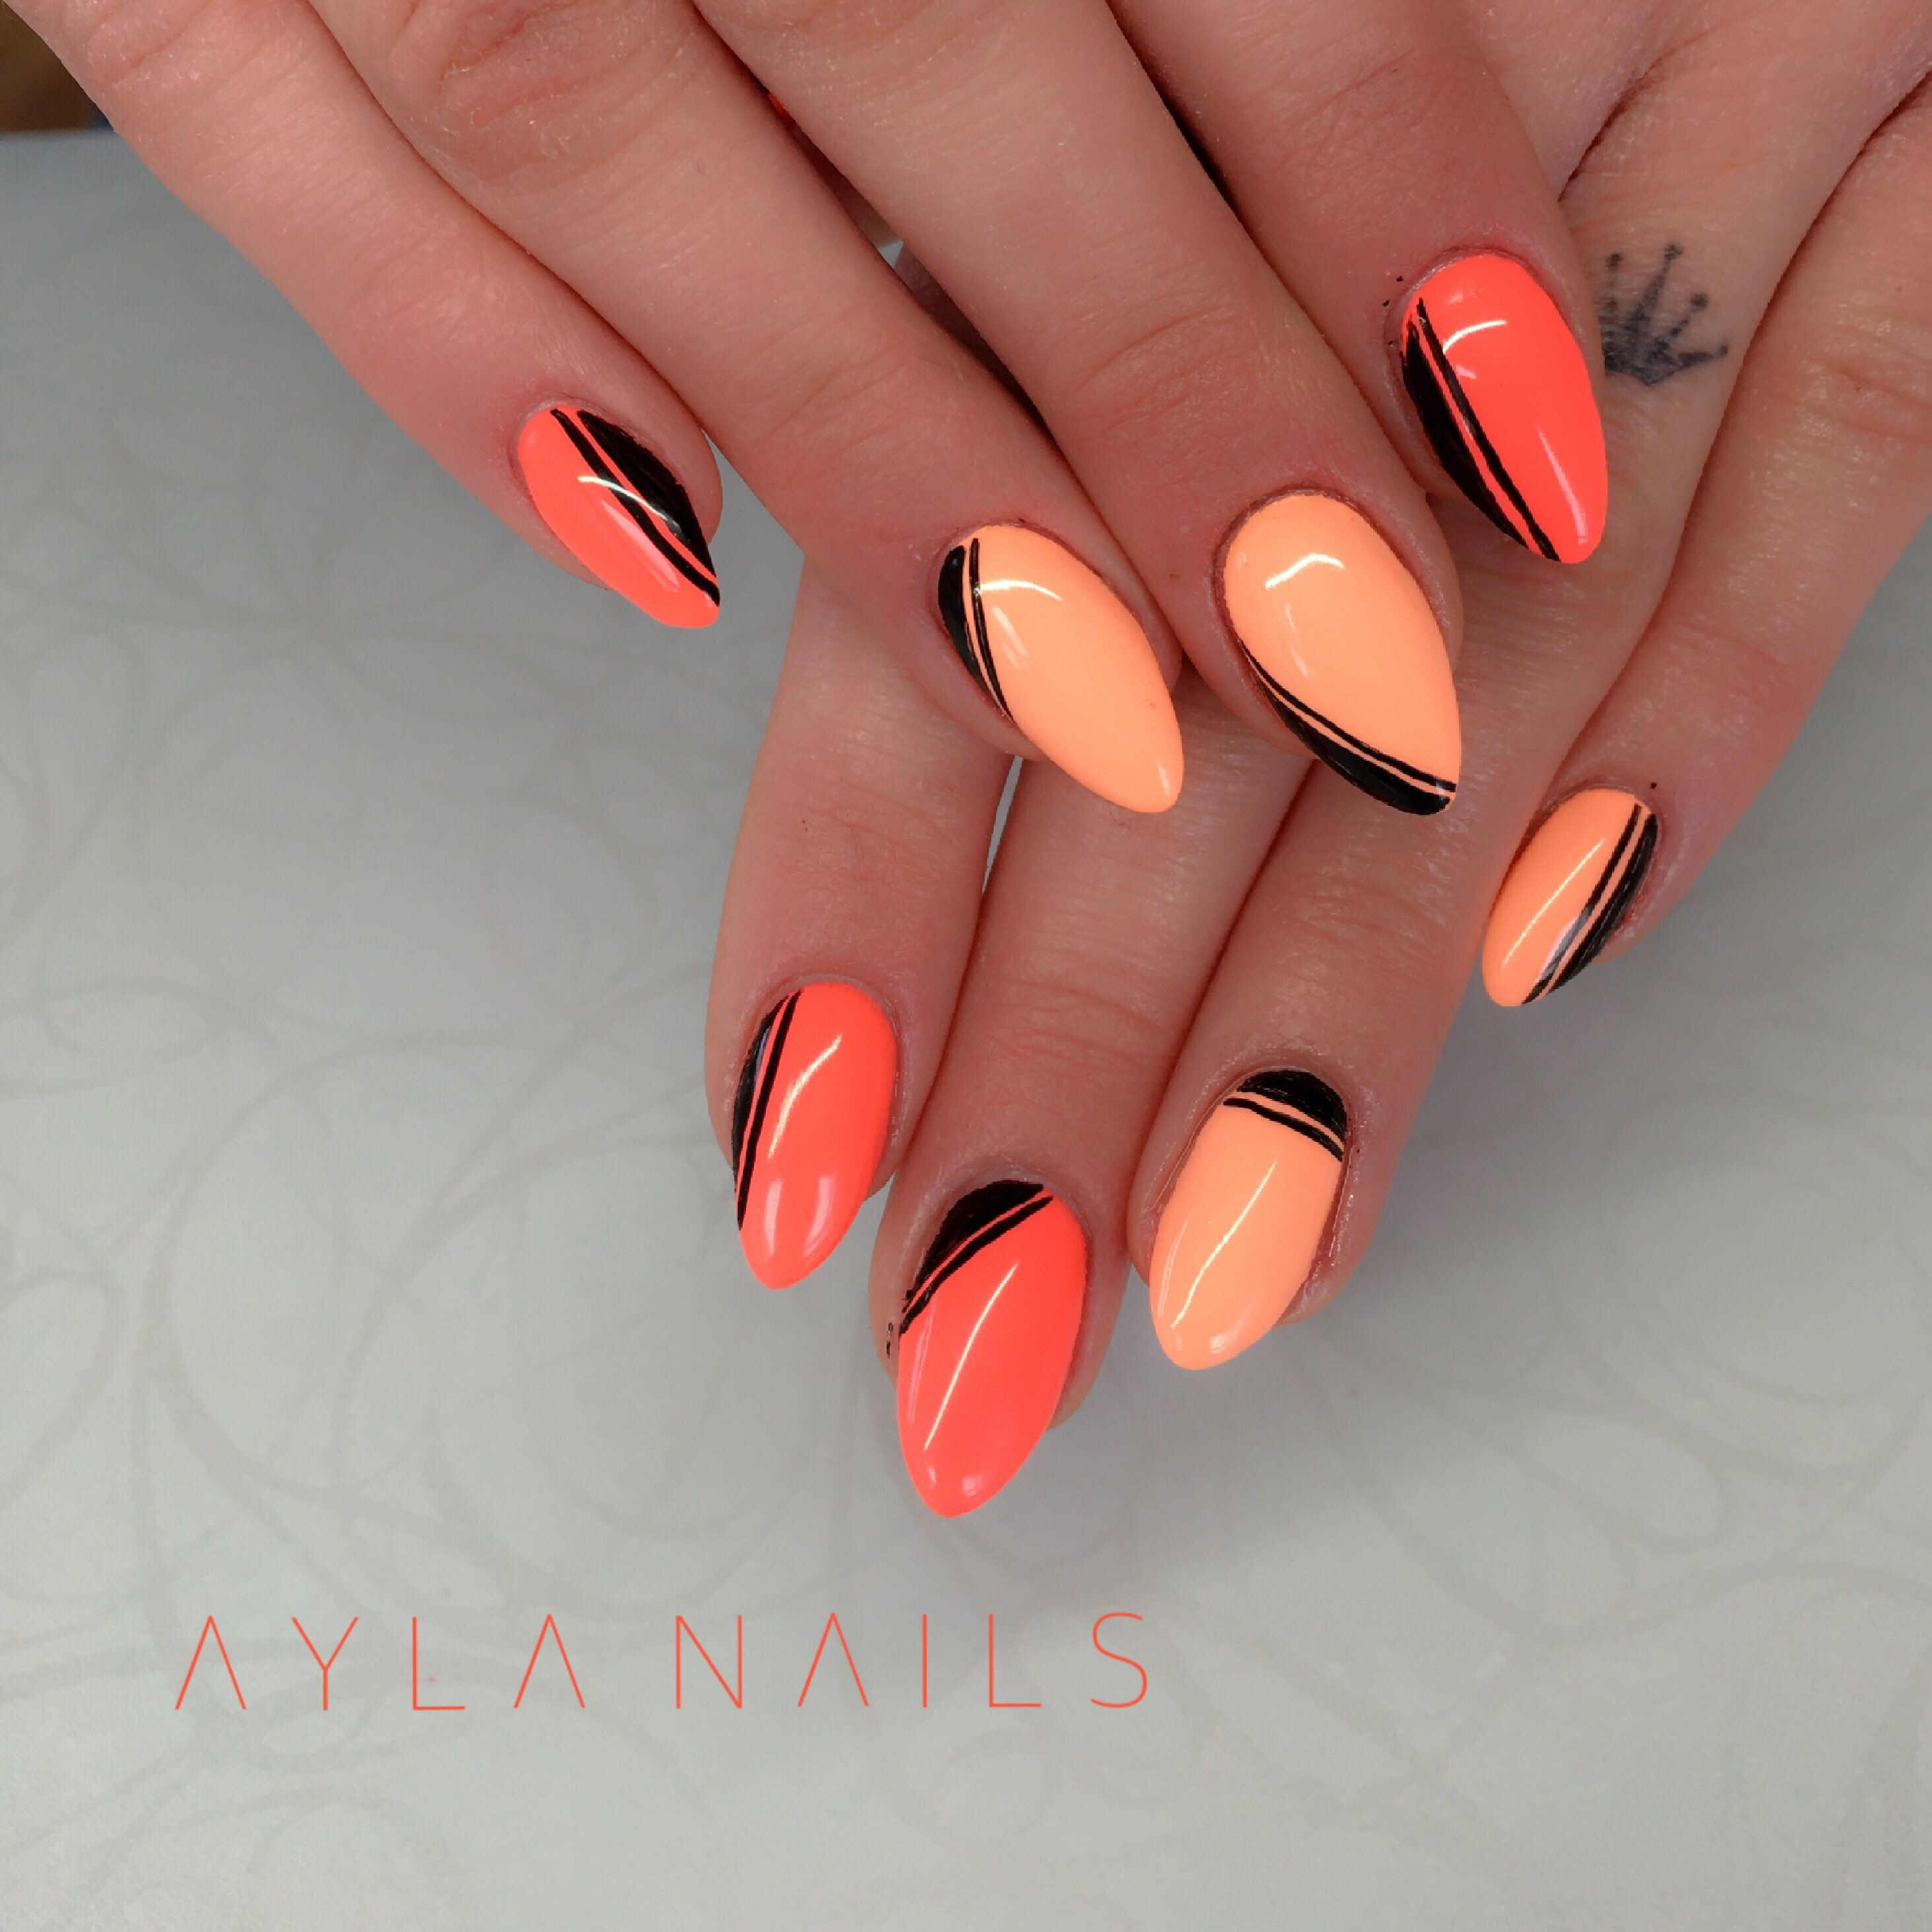 Pin By Alena Burvalova On Ayla Nails Beauty Swag Nails Nail Art Stylish Nails